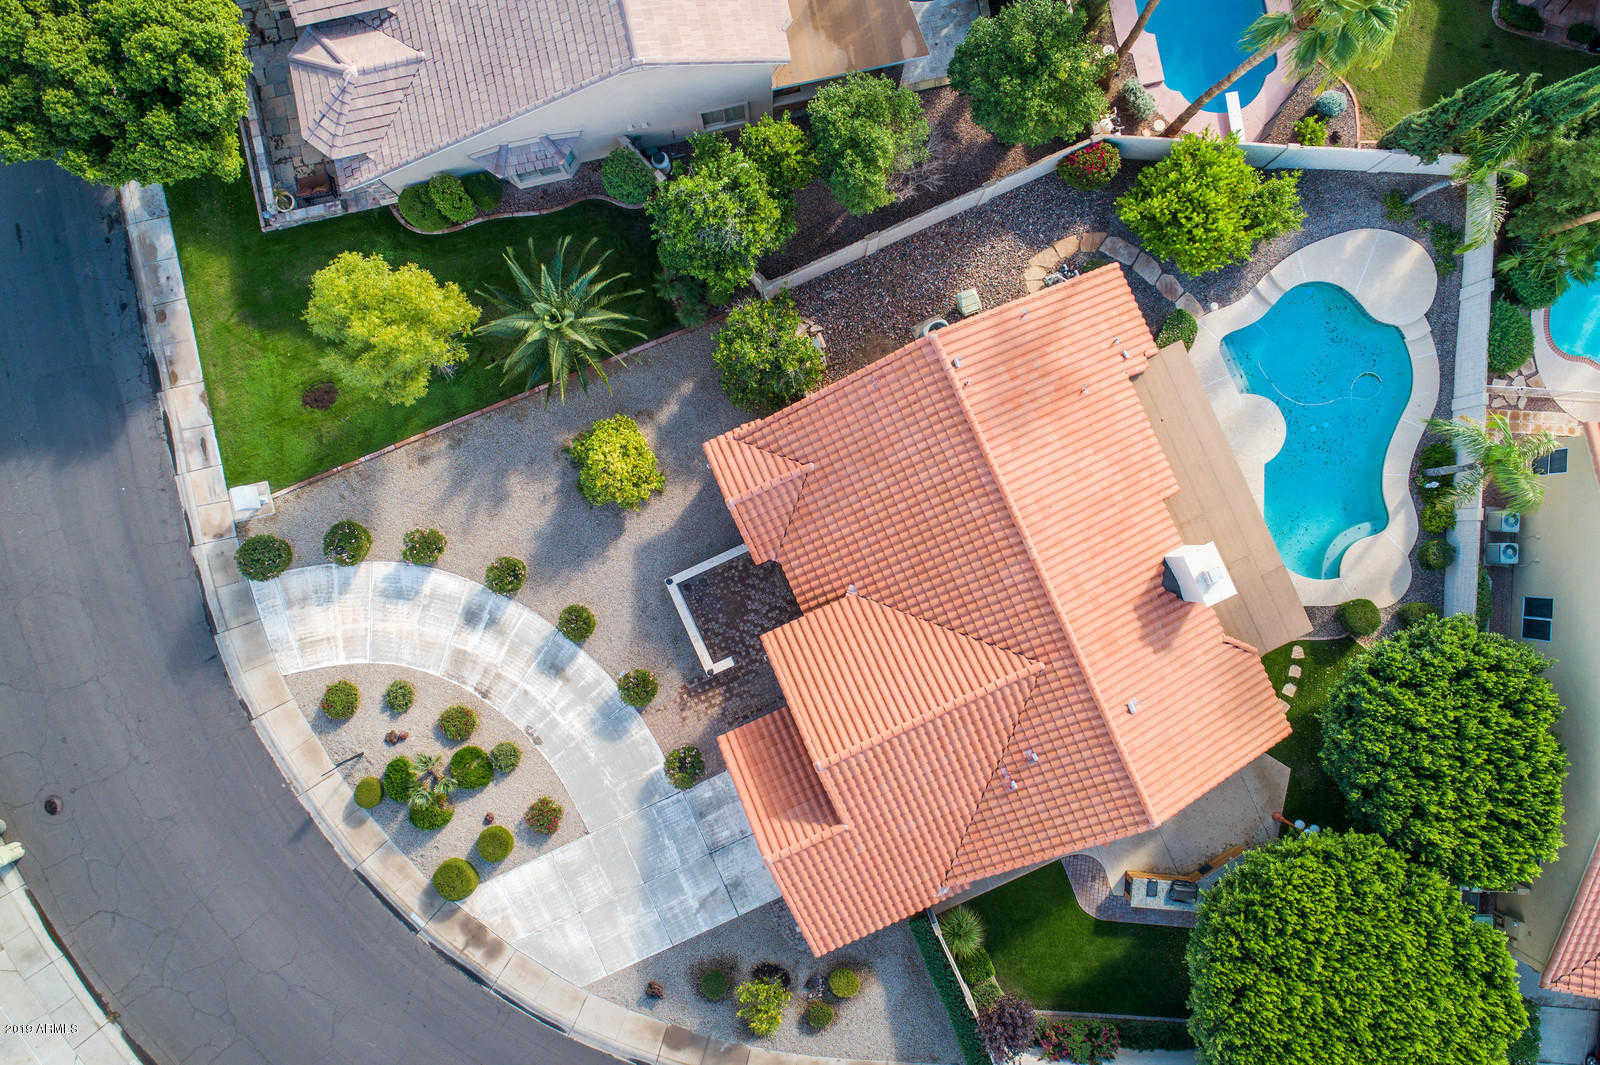 $369,800 - 2Br/2Ba - Home for Sale in Arrowhead Oasis Amd Lt 1-88 Tr A Drainage Easmt, Glendale